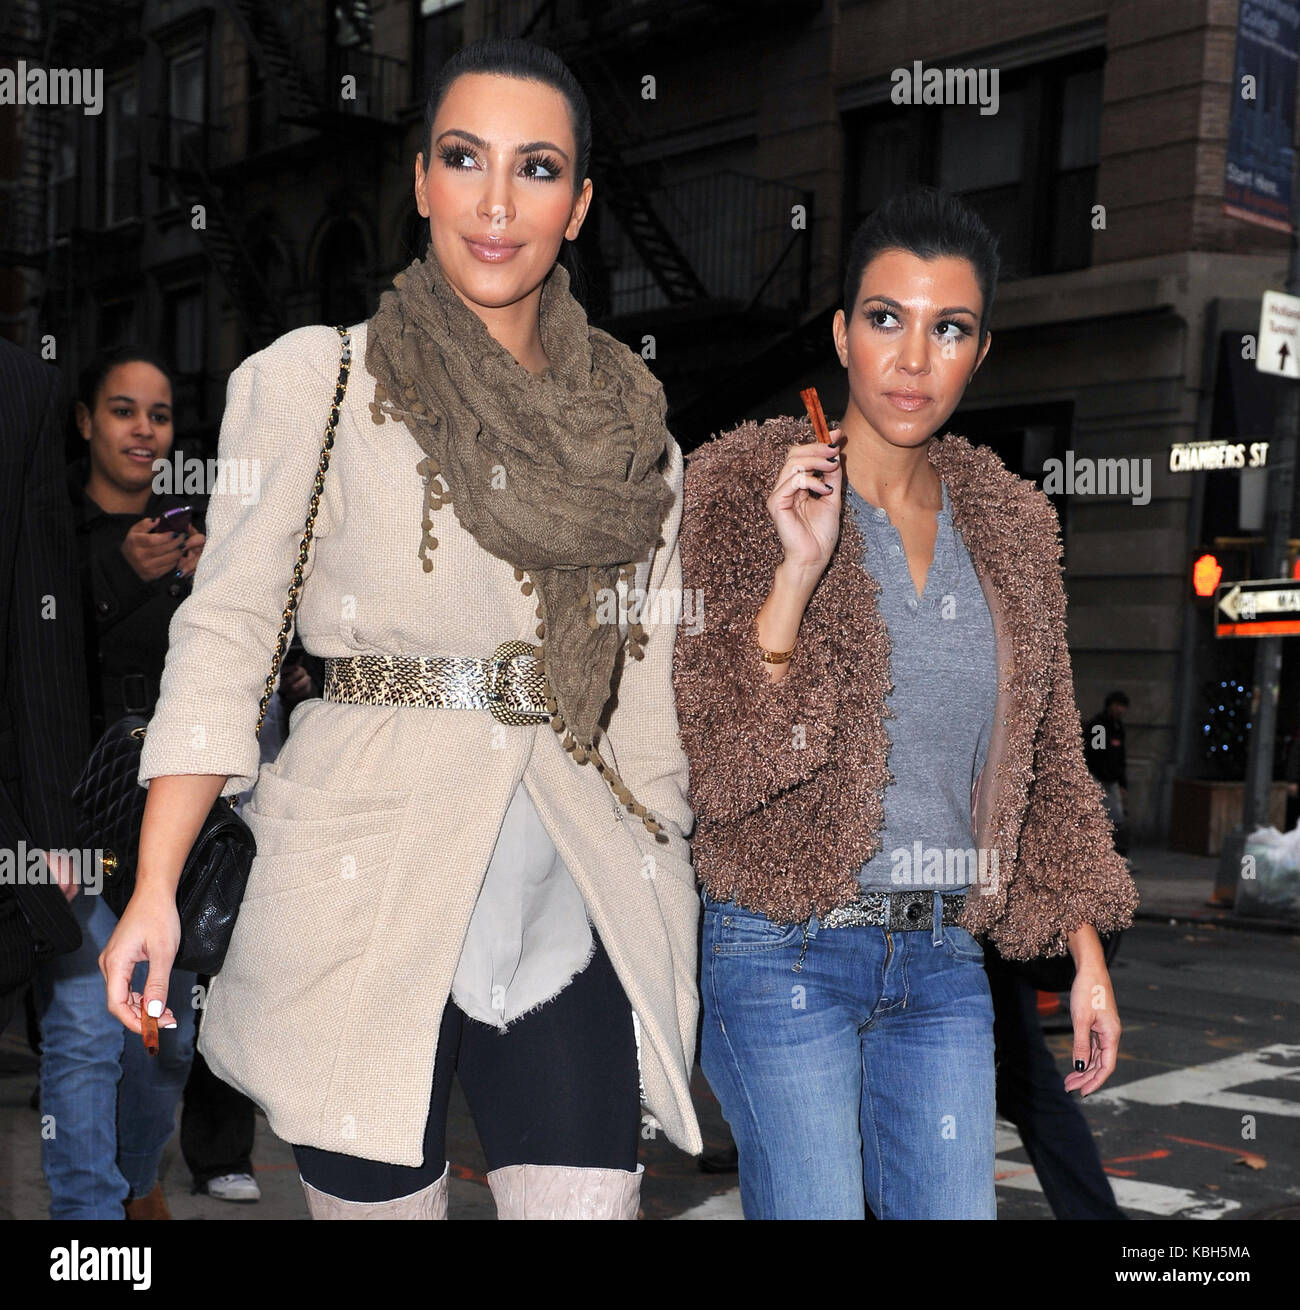 NEW YORK - NOVEMBER 05: Television personalities Kim Kardashian and sister Kourtney Kardashian leave their New York - Stock Image